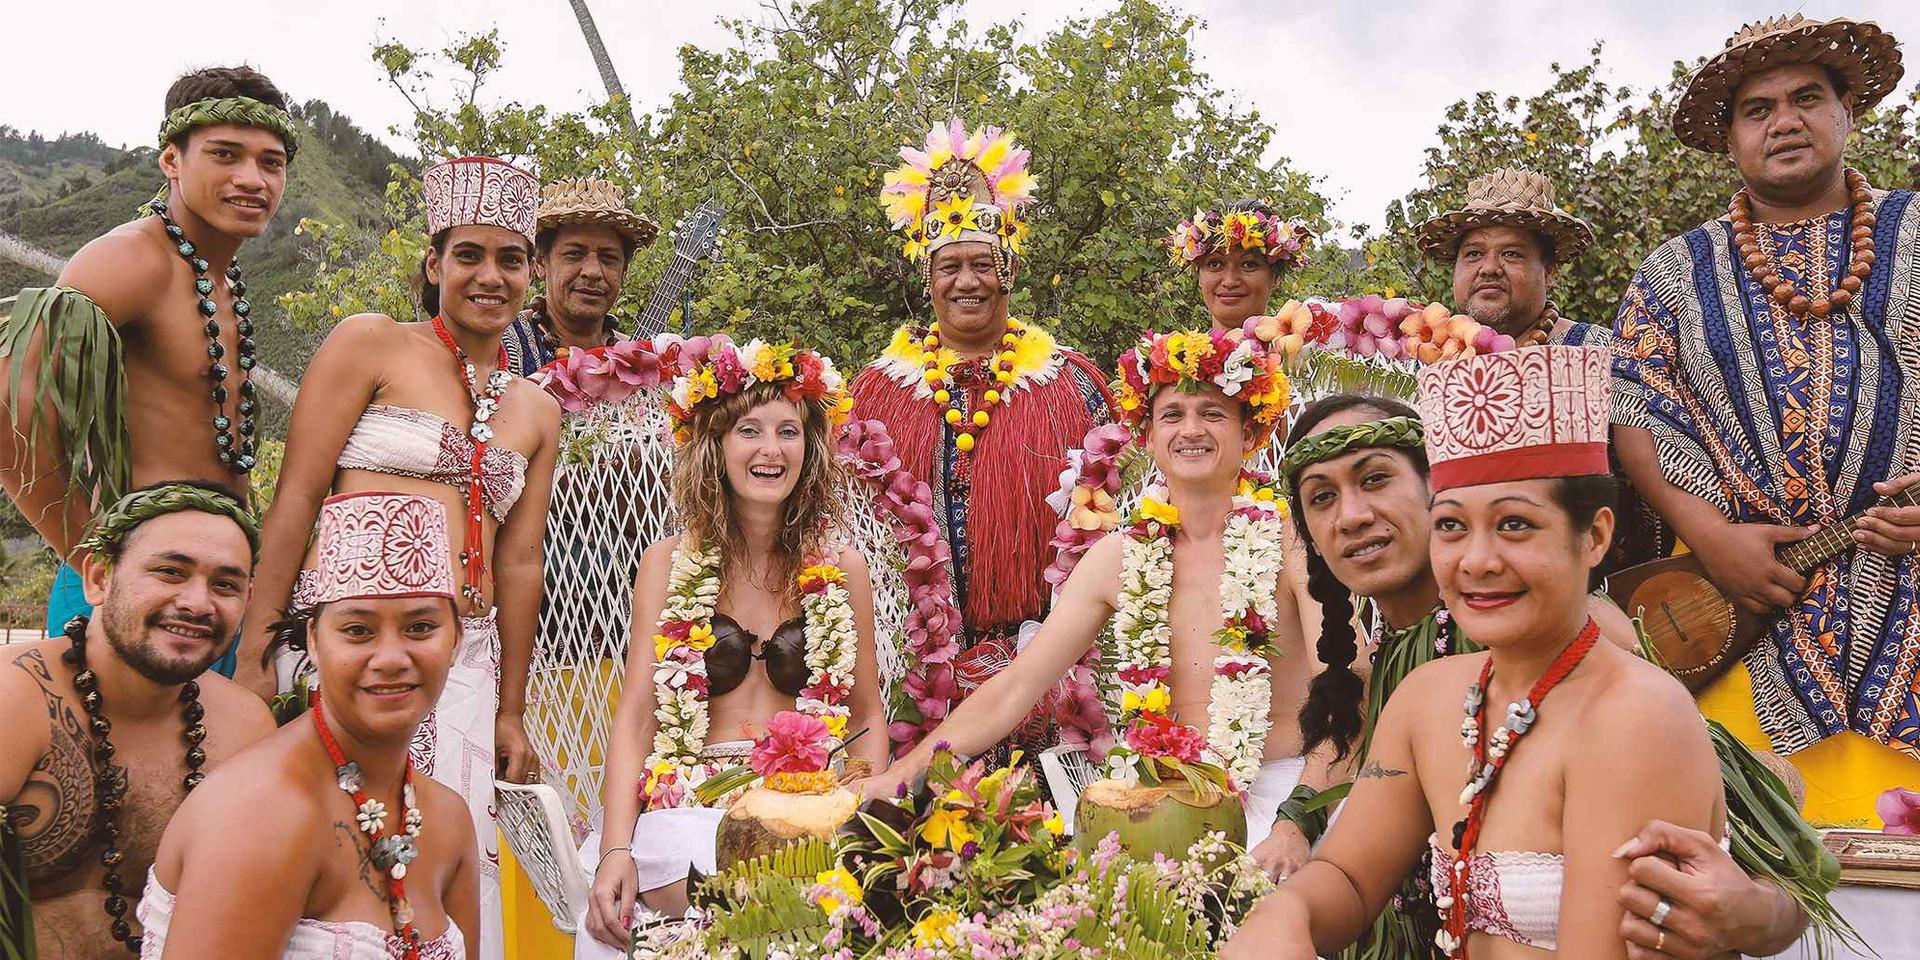 Svadba Tahiti